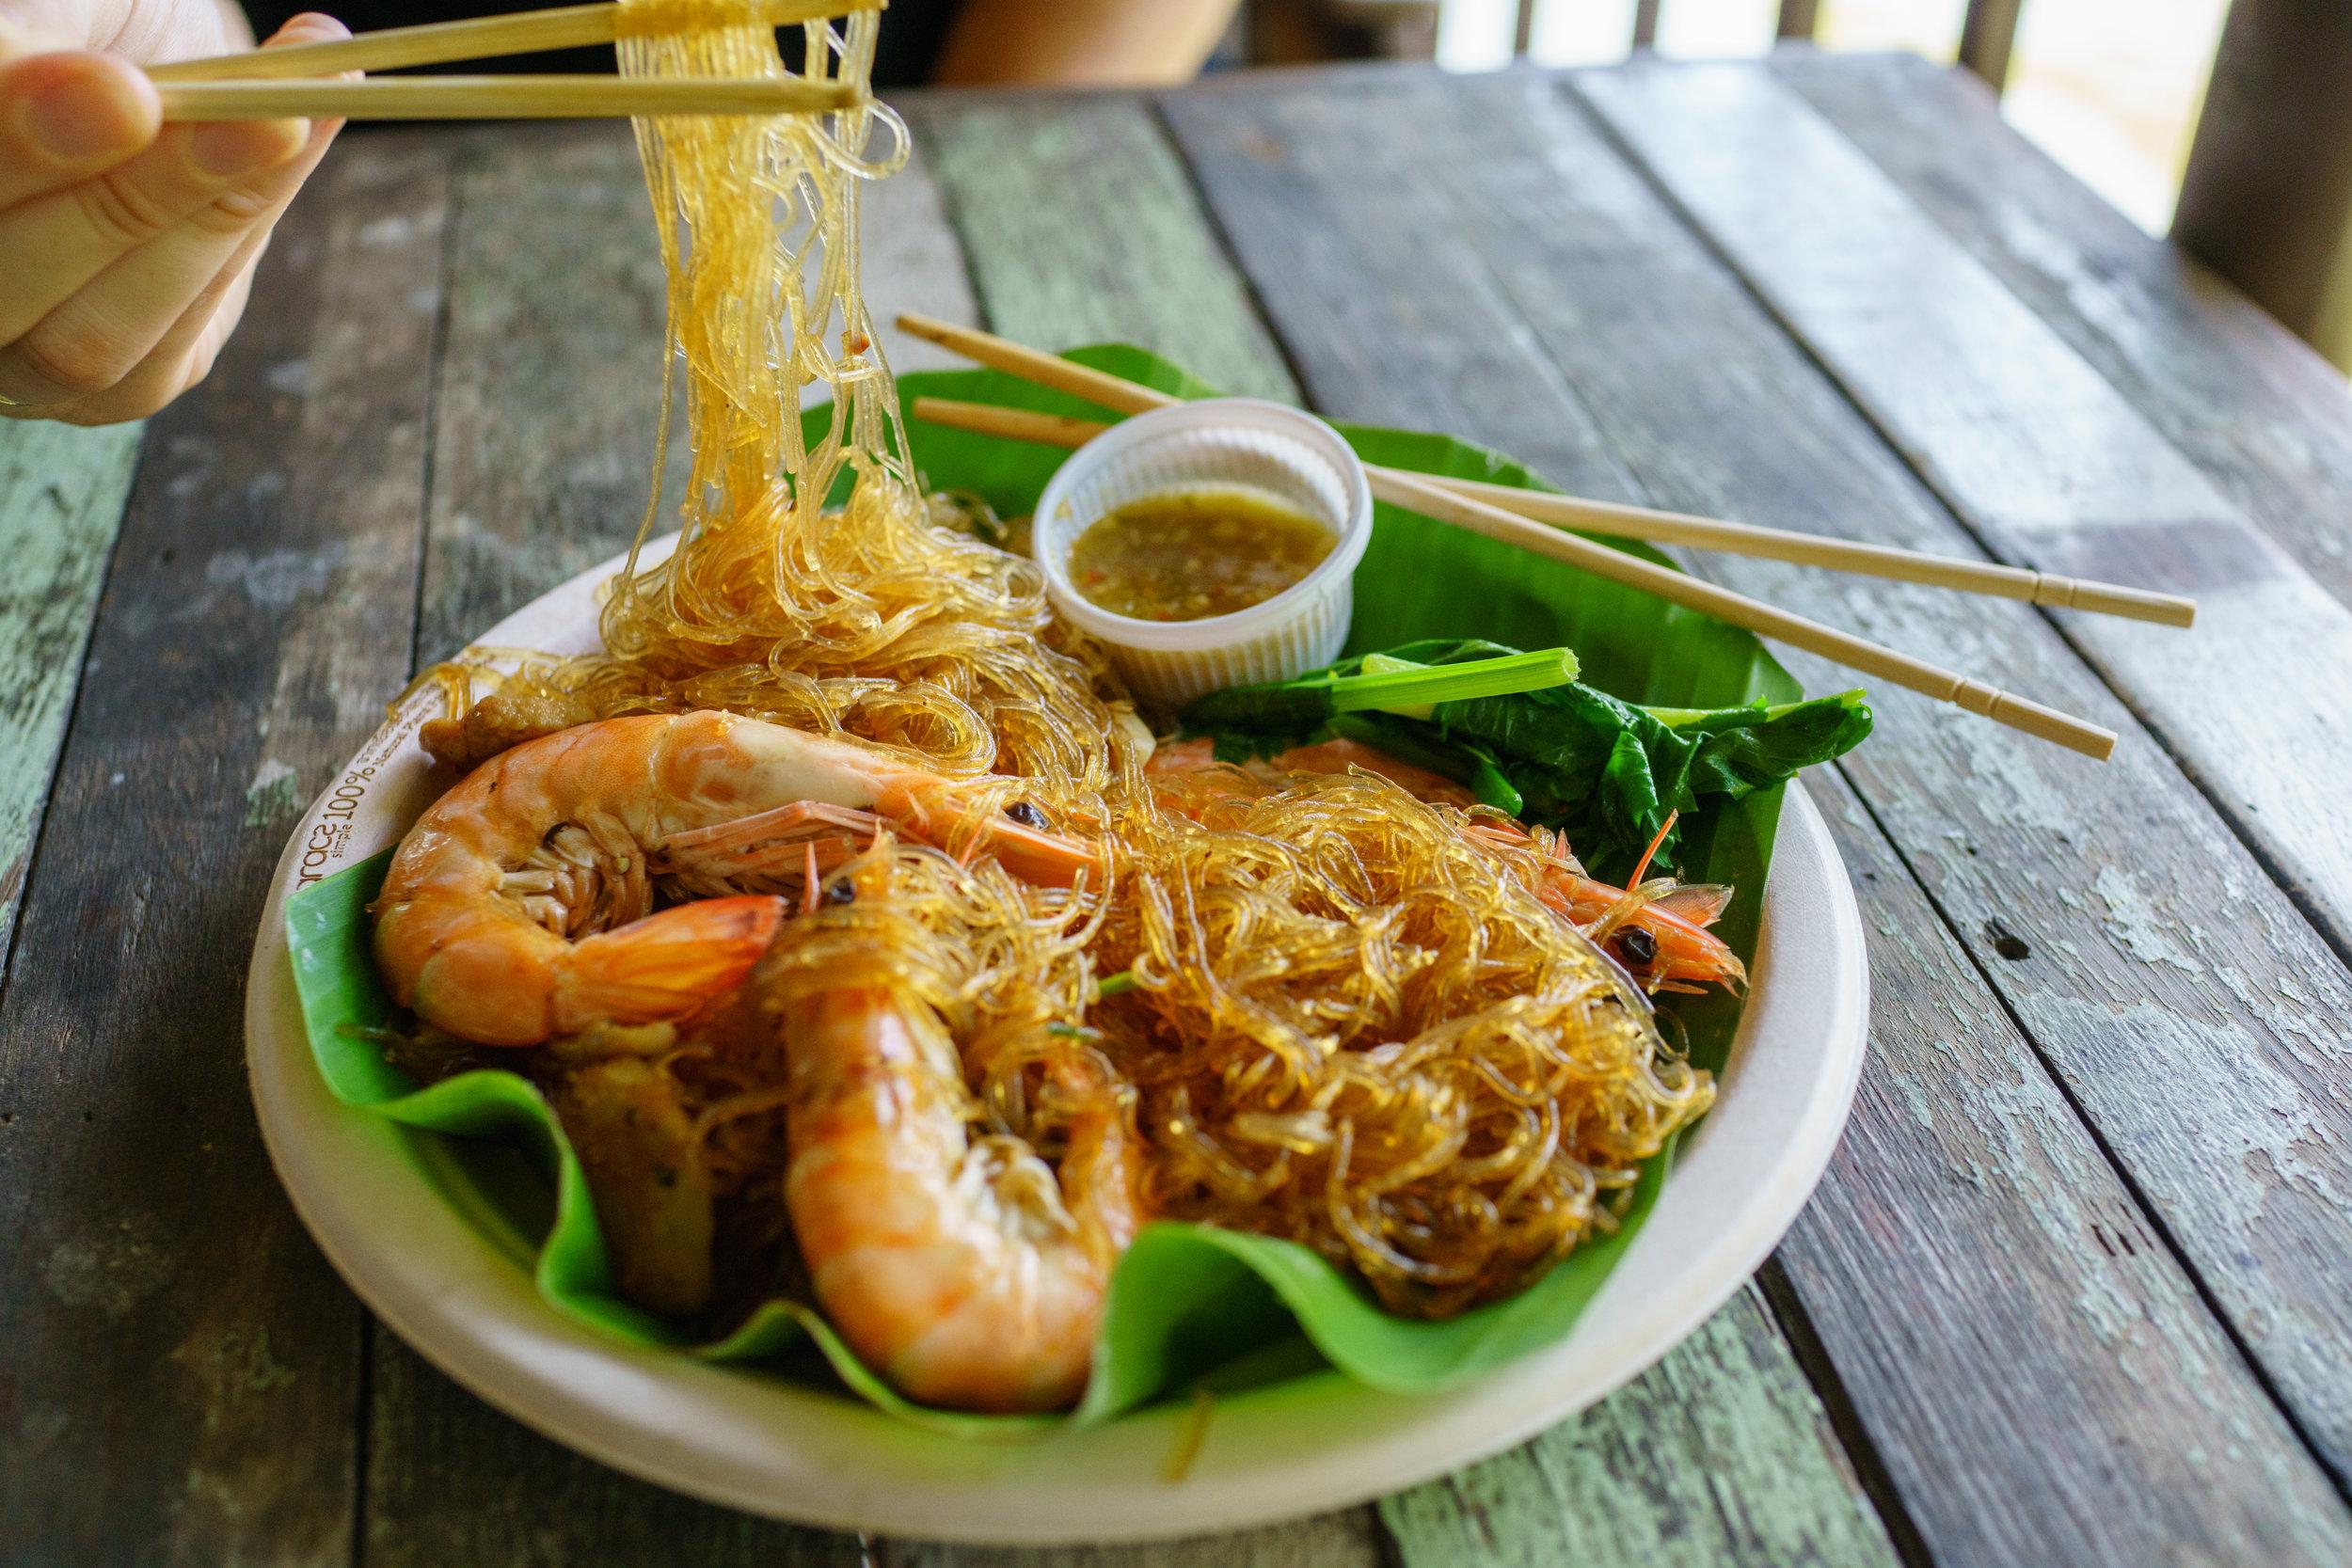 Enjoying   goong ob woon sen , a dish of glass noodles with shrimp